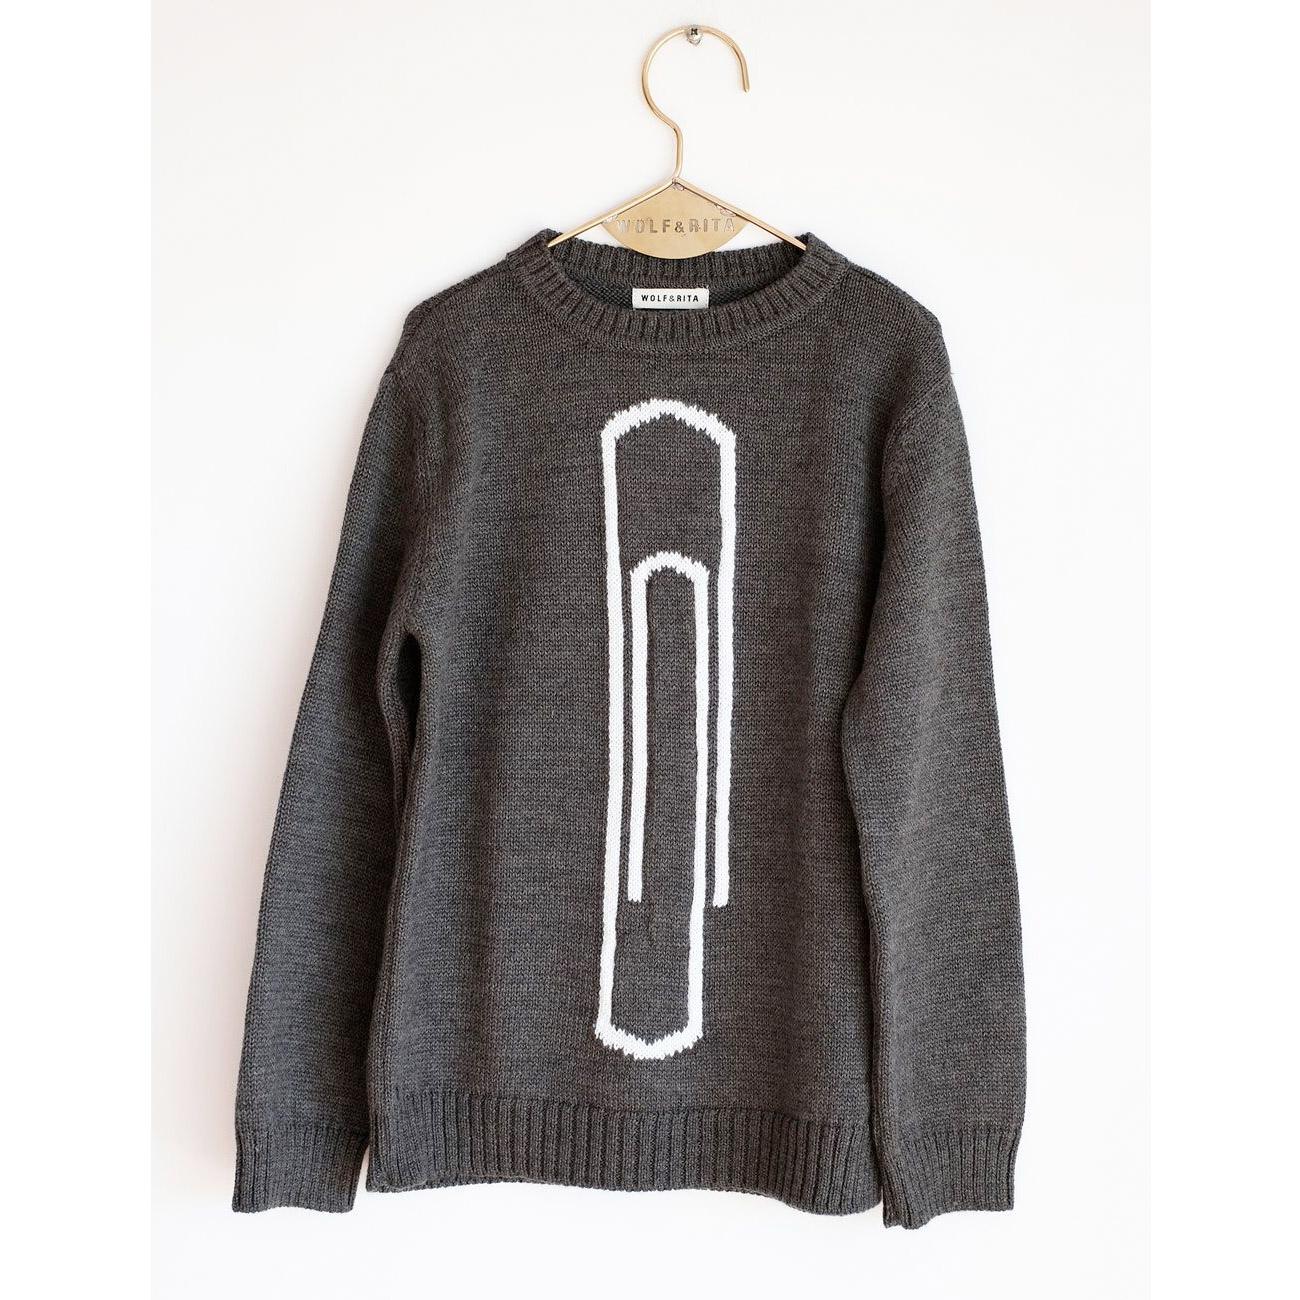 ●WOLF & RITA ウルフ&リタ ポルトガルから 17AW - JOEL  - Sweatshirts 90-100/100-110/110-120